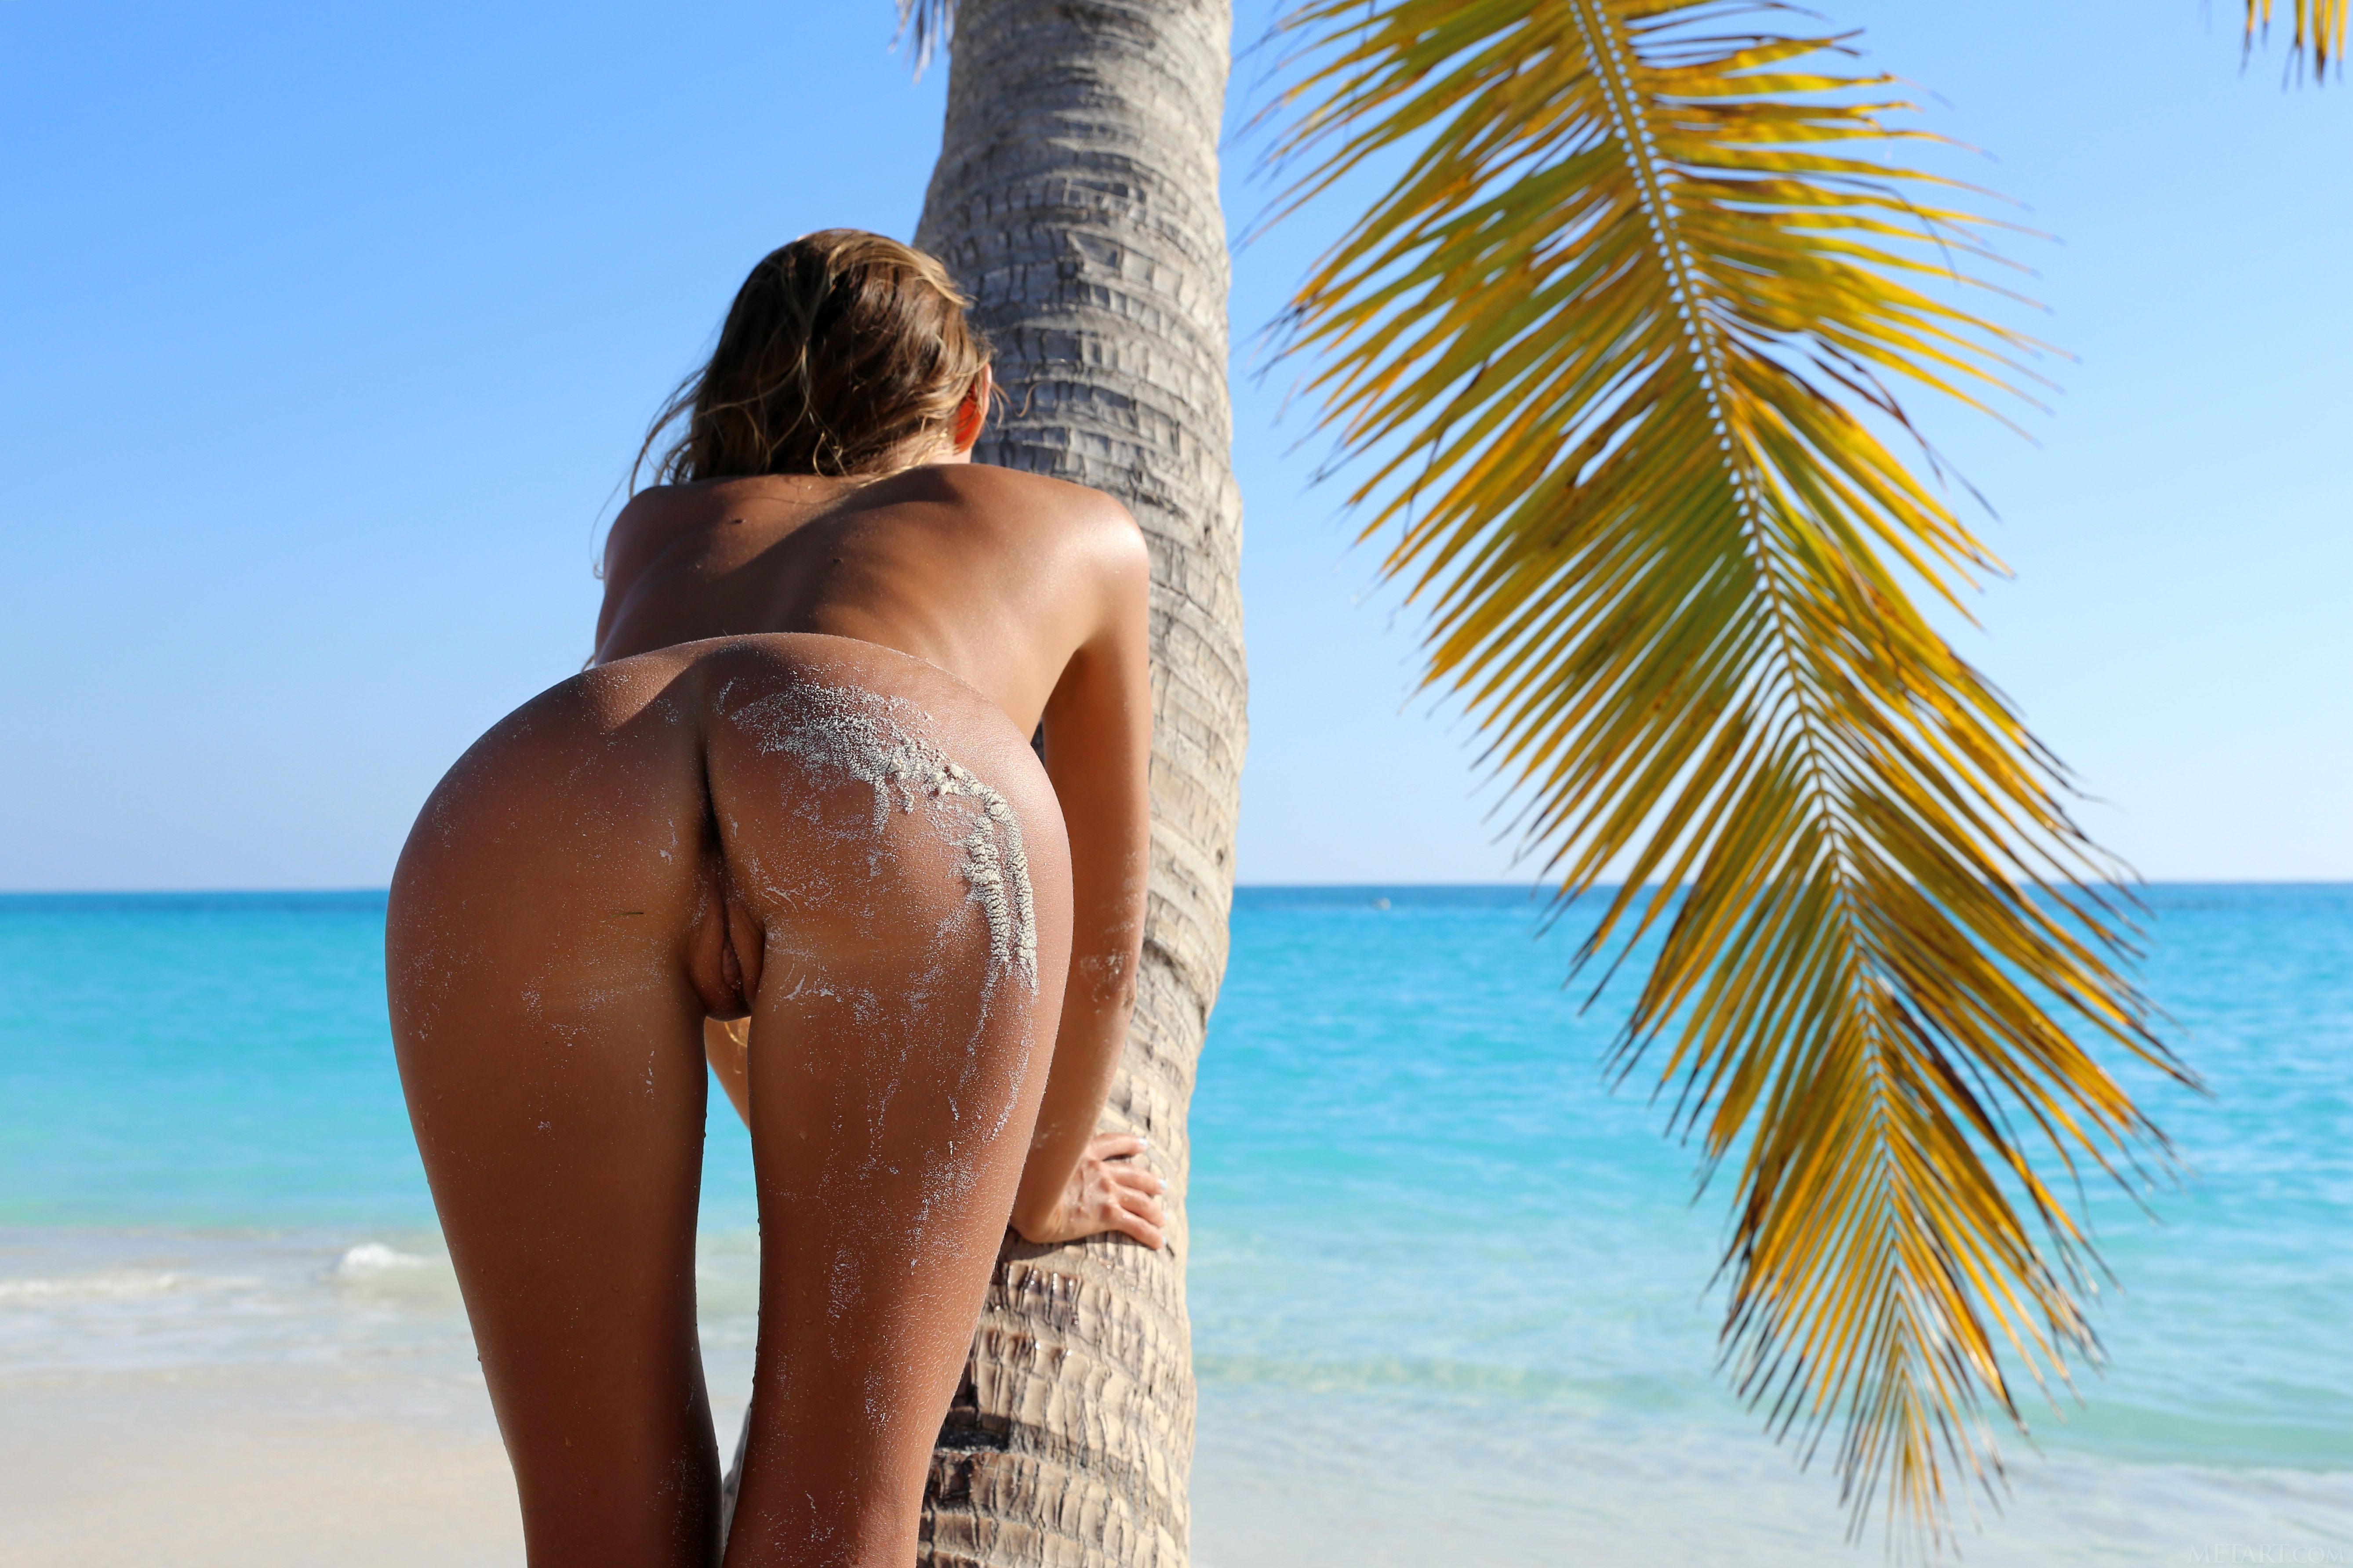 Palm beach pussy